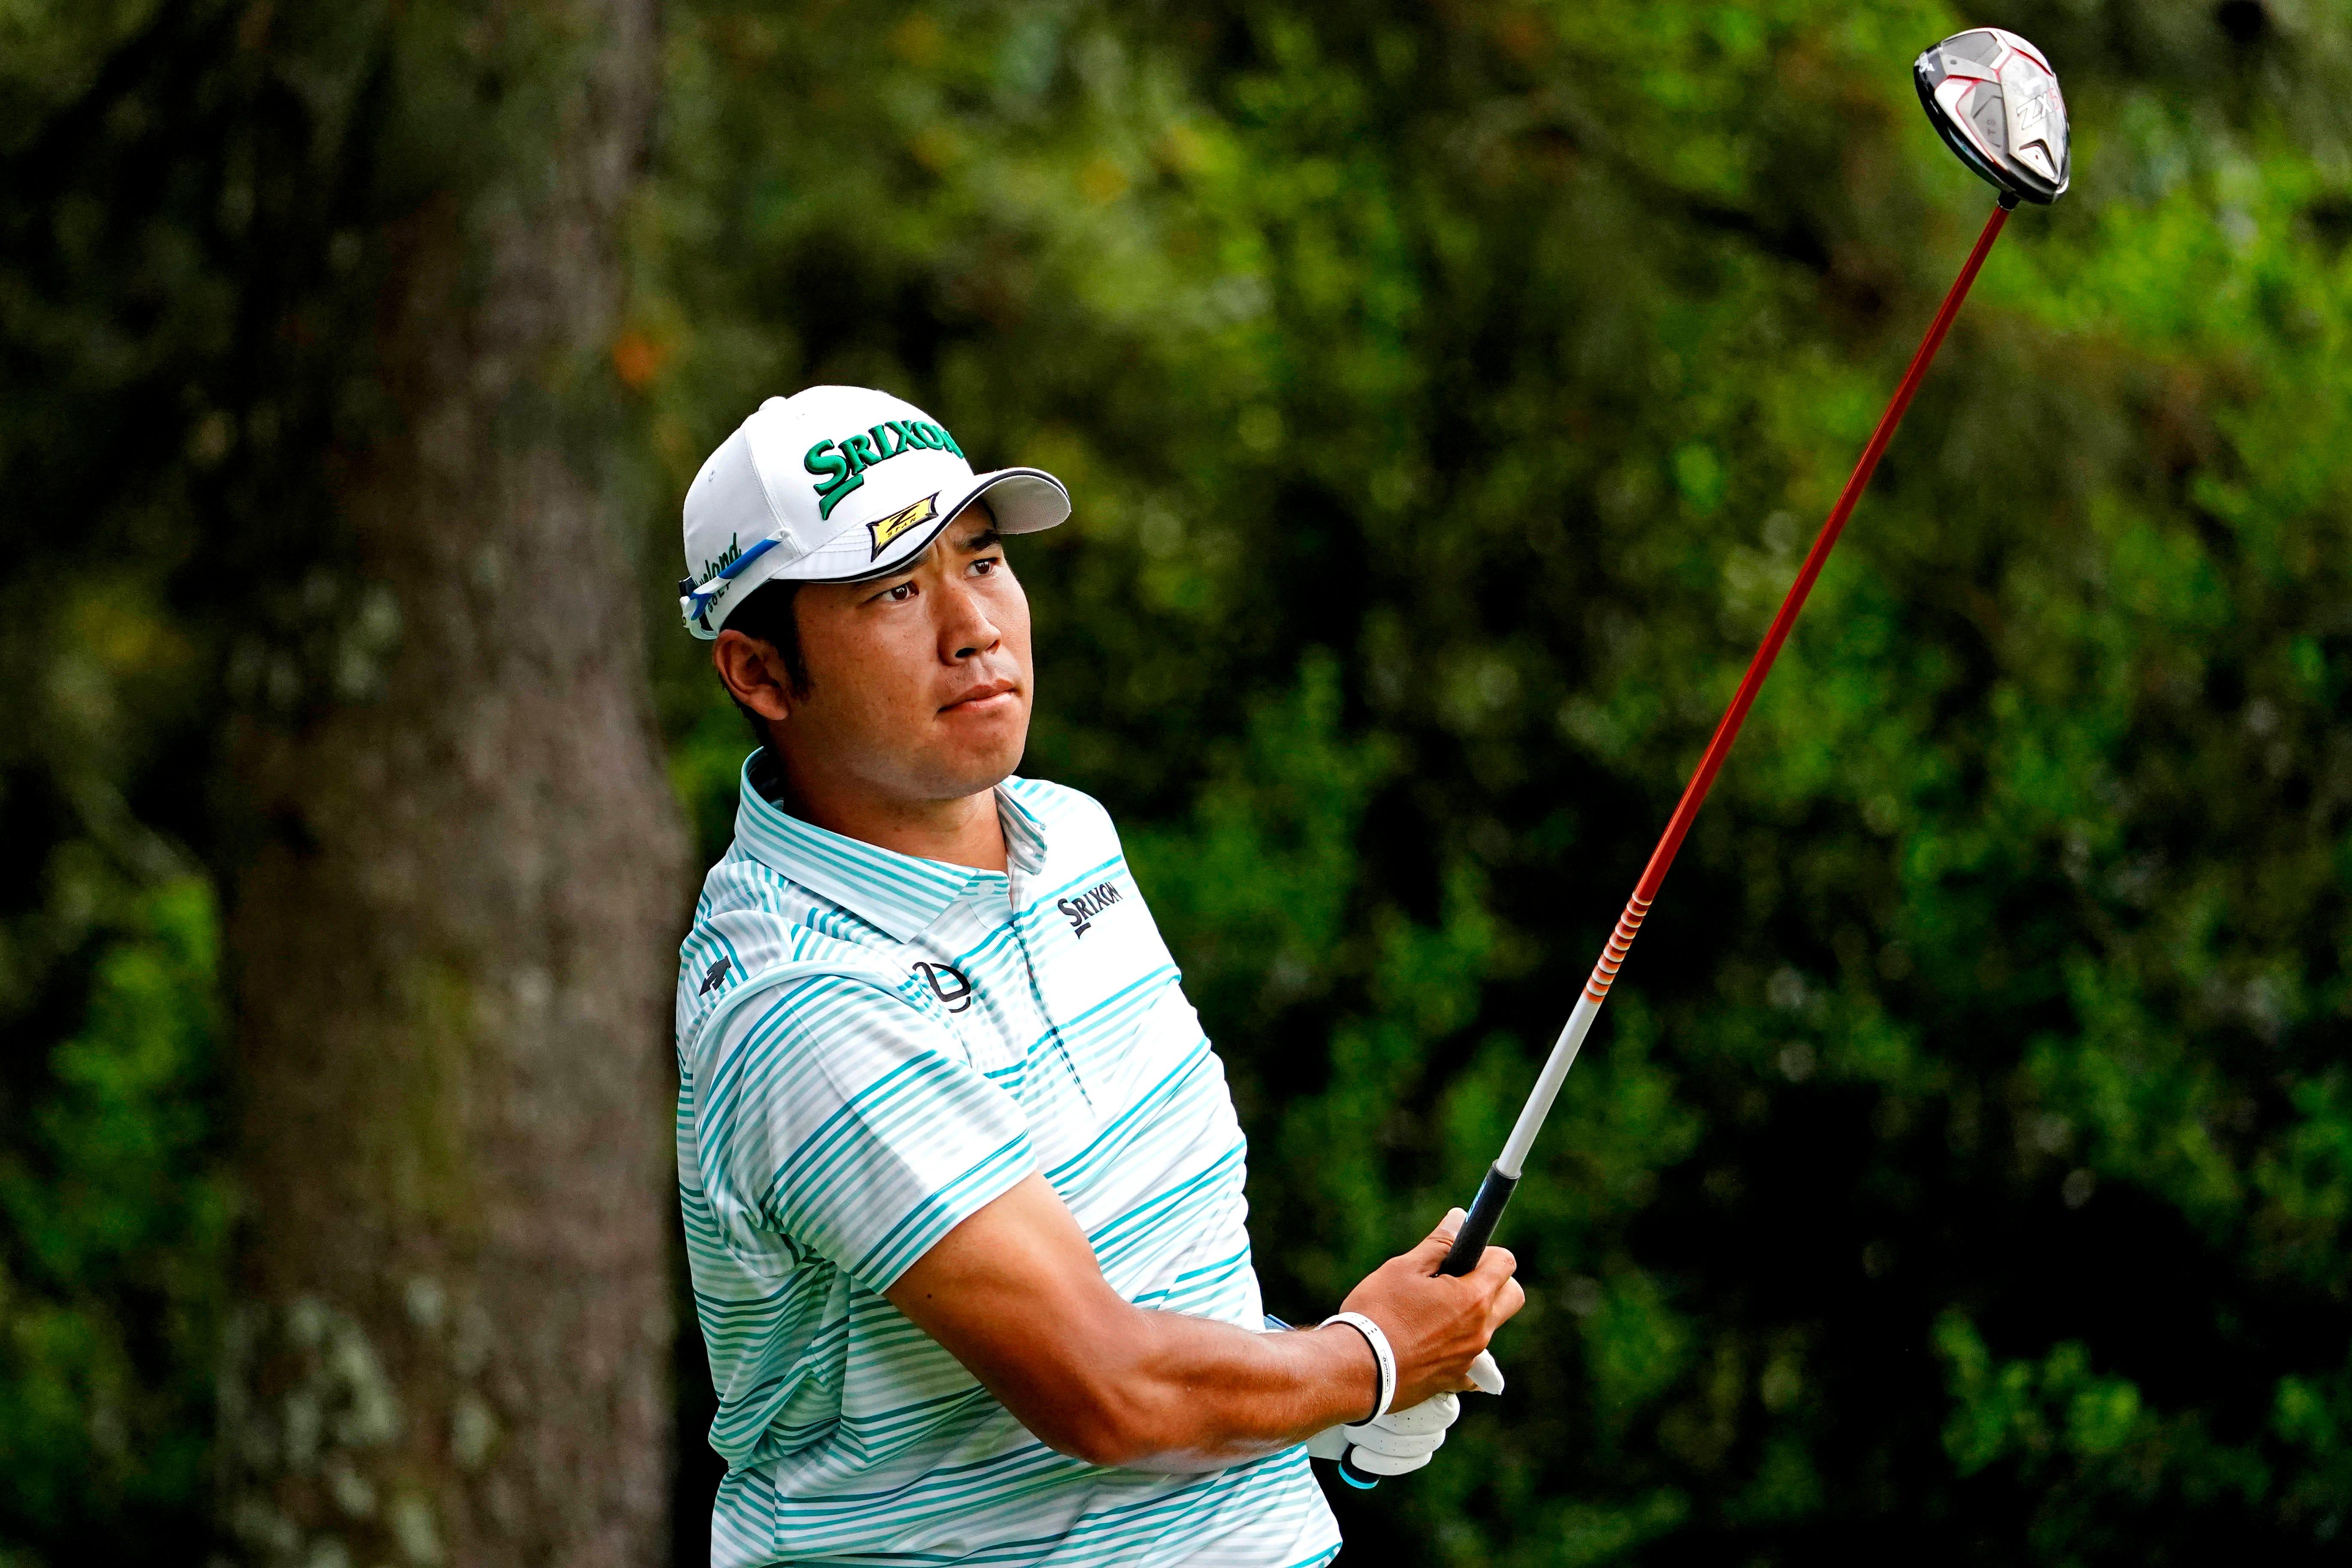 Opinion: Hideki Matsuyama plays video games during delay on way to 4-shot Masters lead